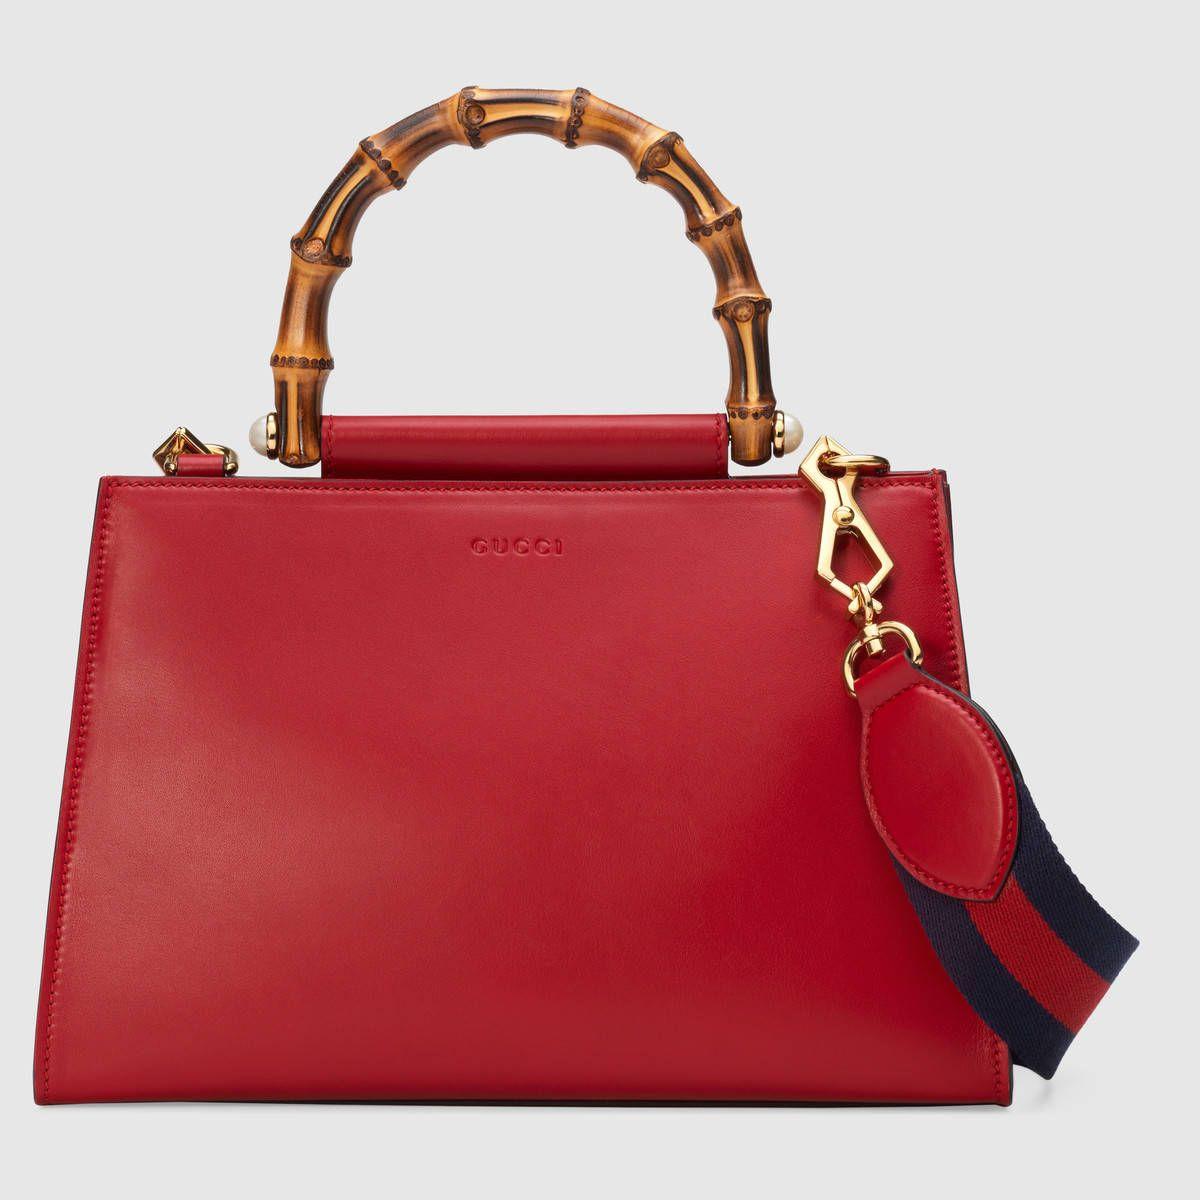 ba3e9ec60f Gucci Nymphaea leather top handle bag   Leather Goods   Gucci ...